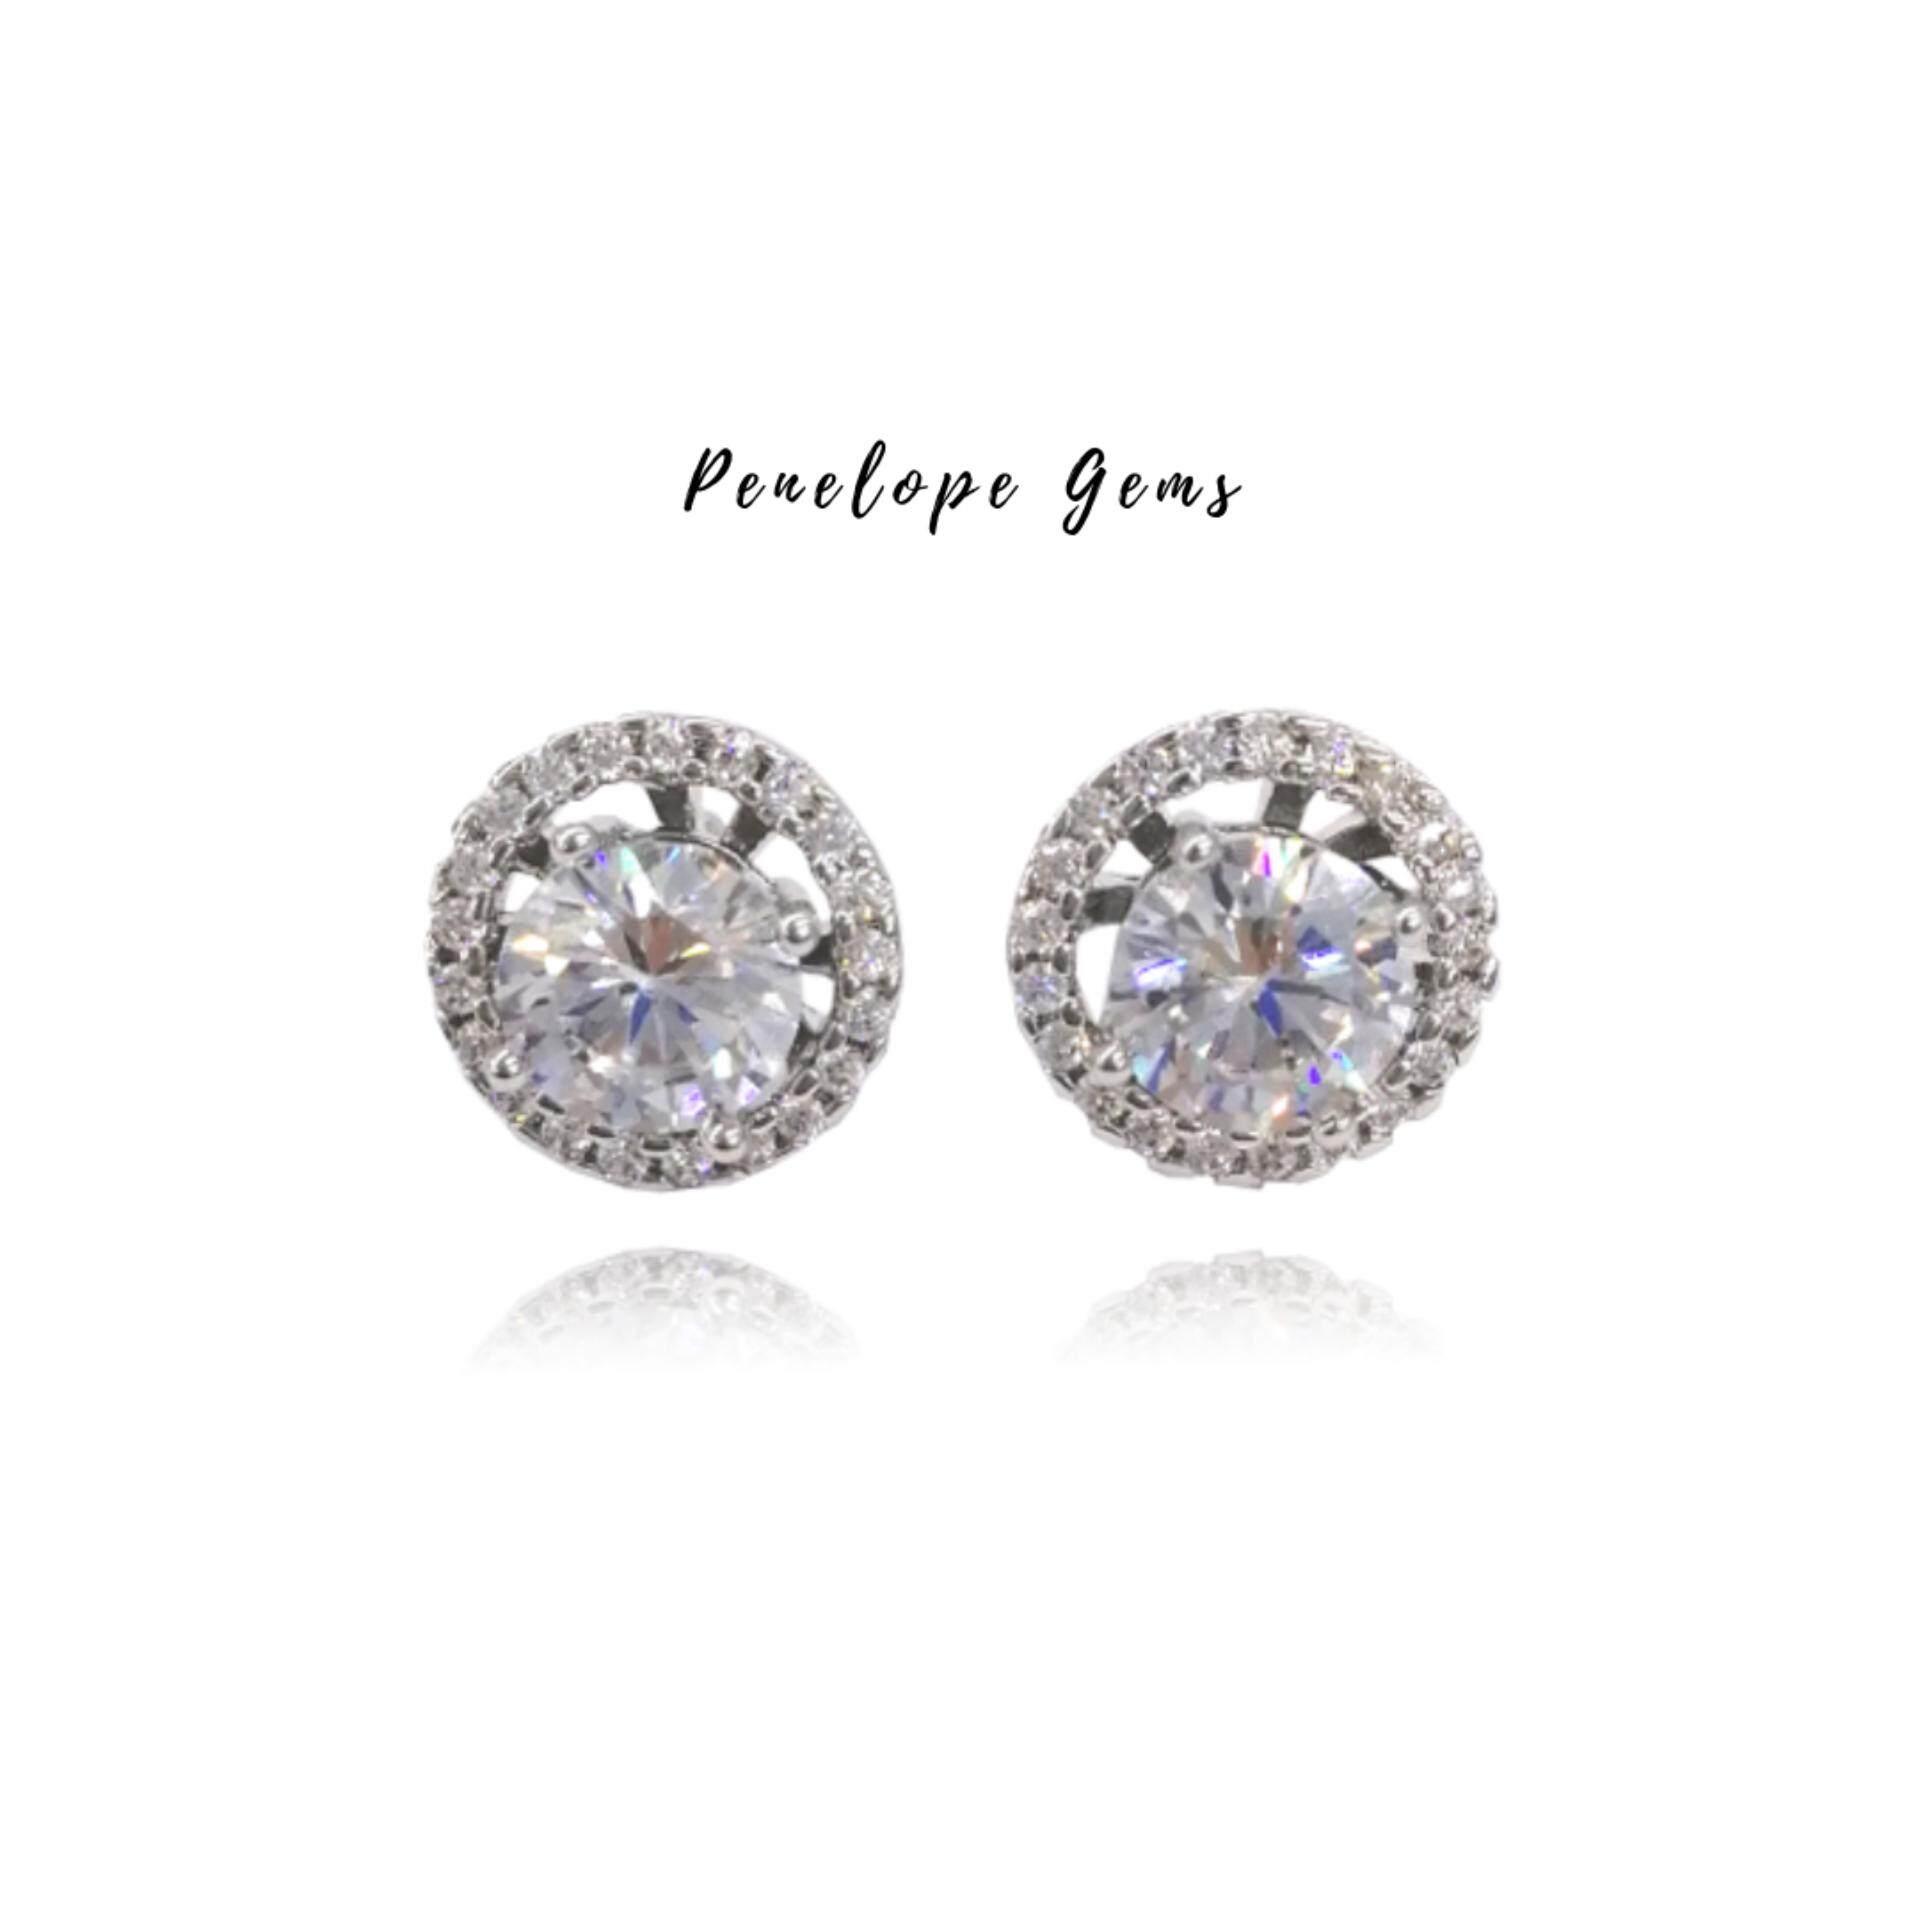 Penelope ต่างหูเพชรล้อมcz ใส่ได้ 2 แบบ ชุบทองคำขาว ก้านเงินแท้ Swarovski Earrings ต่างหูแฟชั่น ต่างหูเงินแท้ ต่างหูเงิน ต่างหูเกาหลี ต่างหูแป้น ต่างหูผู้หญิง By Penelope Gems.